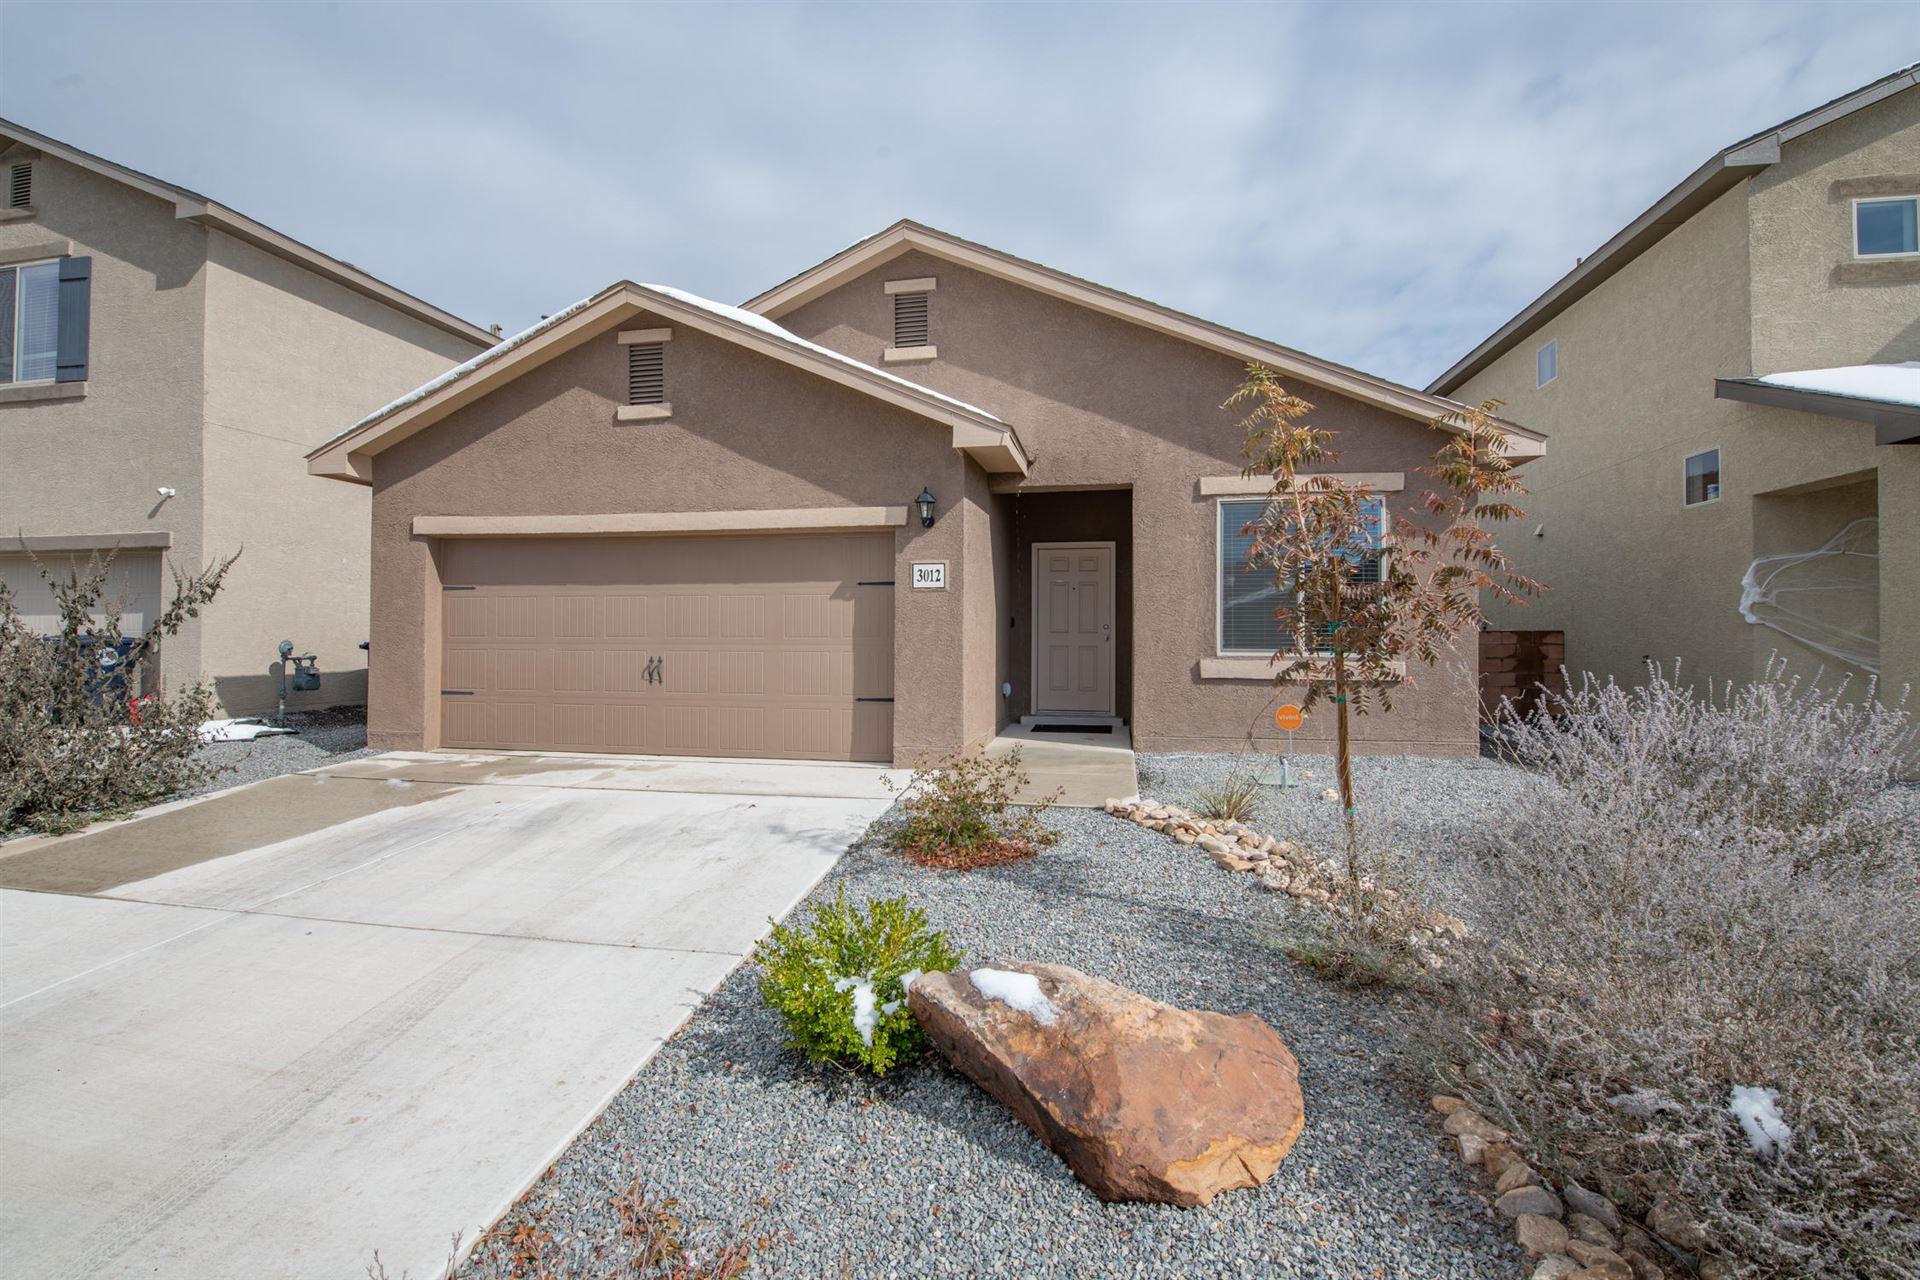 Photo of 3012 PAUZA Drive SW, Albuquerque, NM 87121 (MLS # 980122)